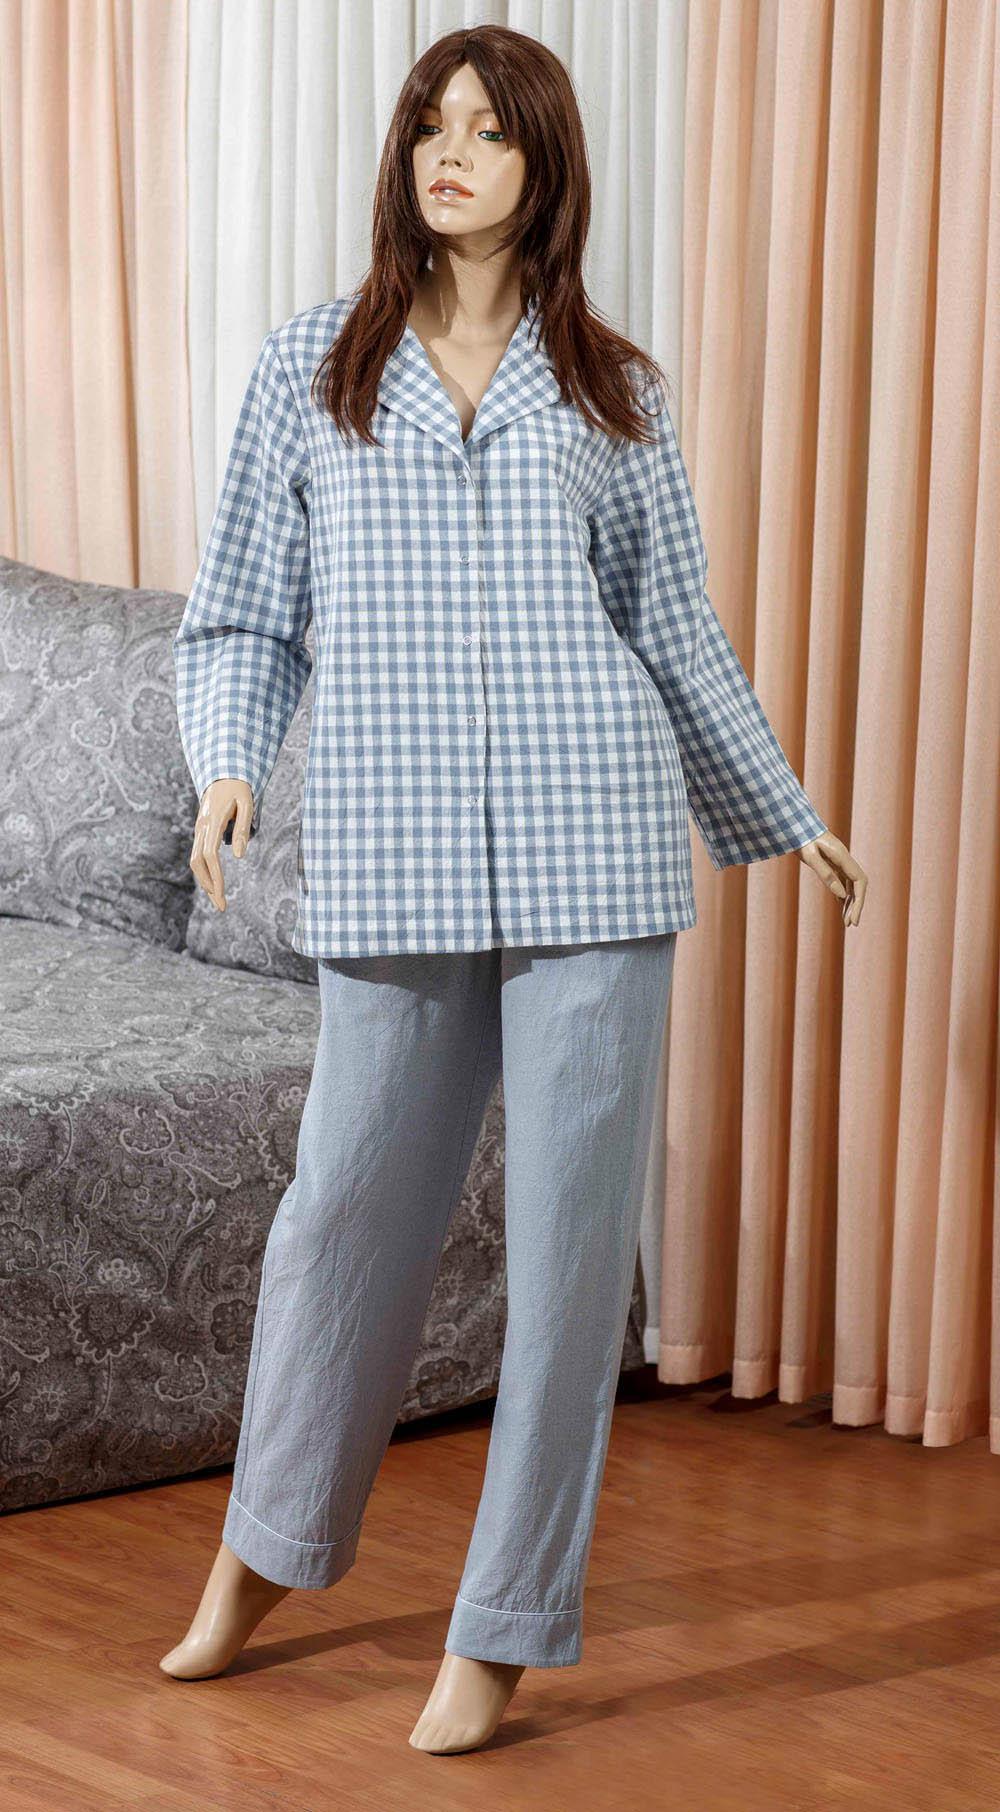 Брюки Primavelle Одежда для дома Vera Цвет: Голубой (M-L) футболки primavelle одежда для дома vera цвет зеленый m l